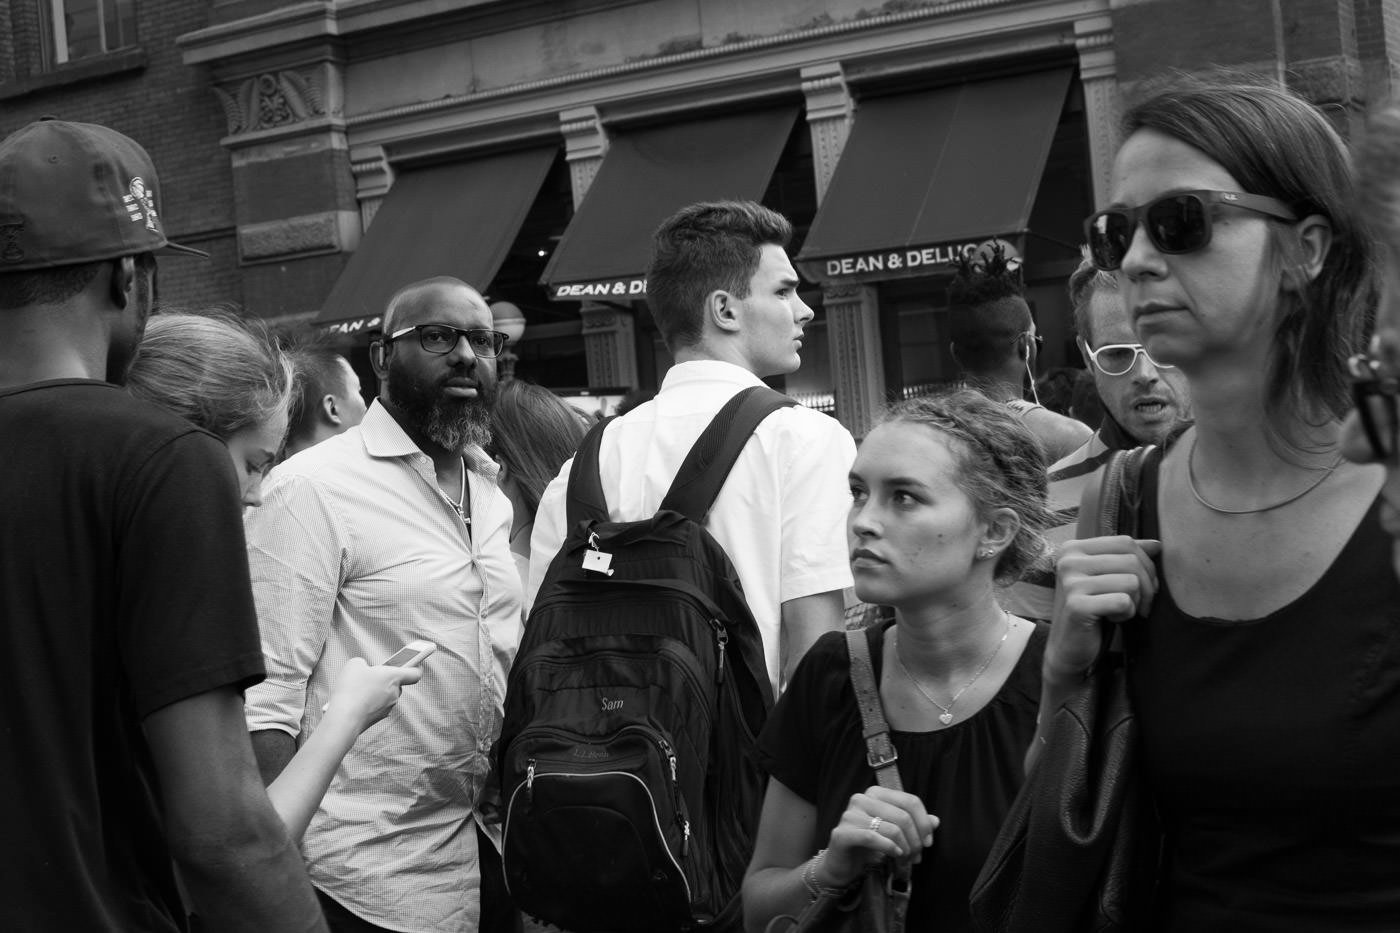 Street photography: Shot taken in crowd of pedestrians